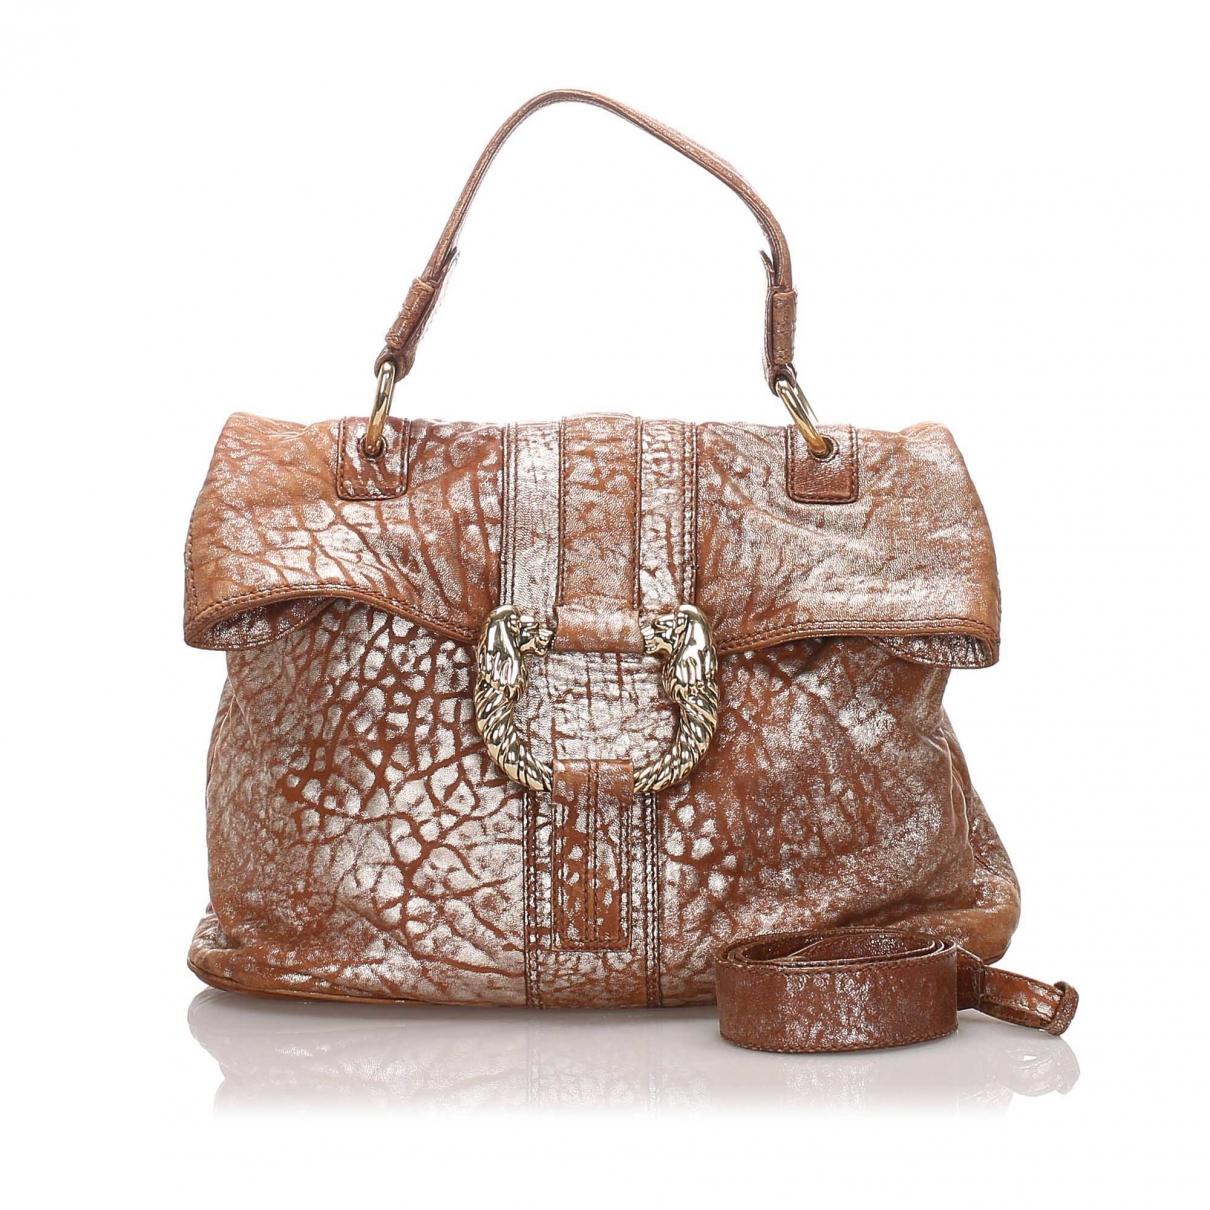 Bvlgari \N Silver Leather handbag for Women \N